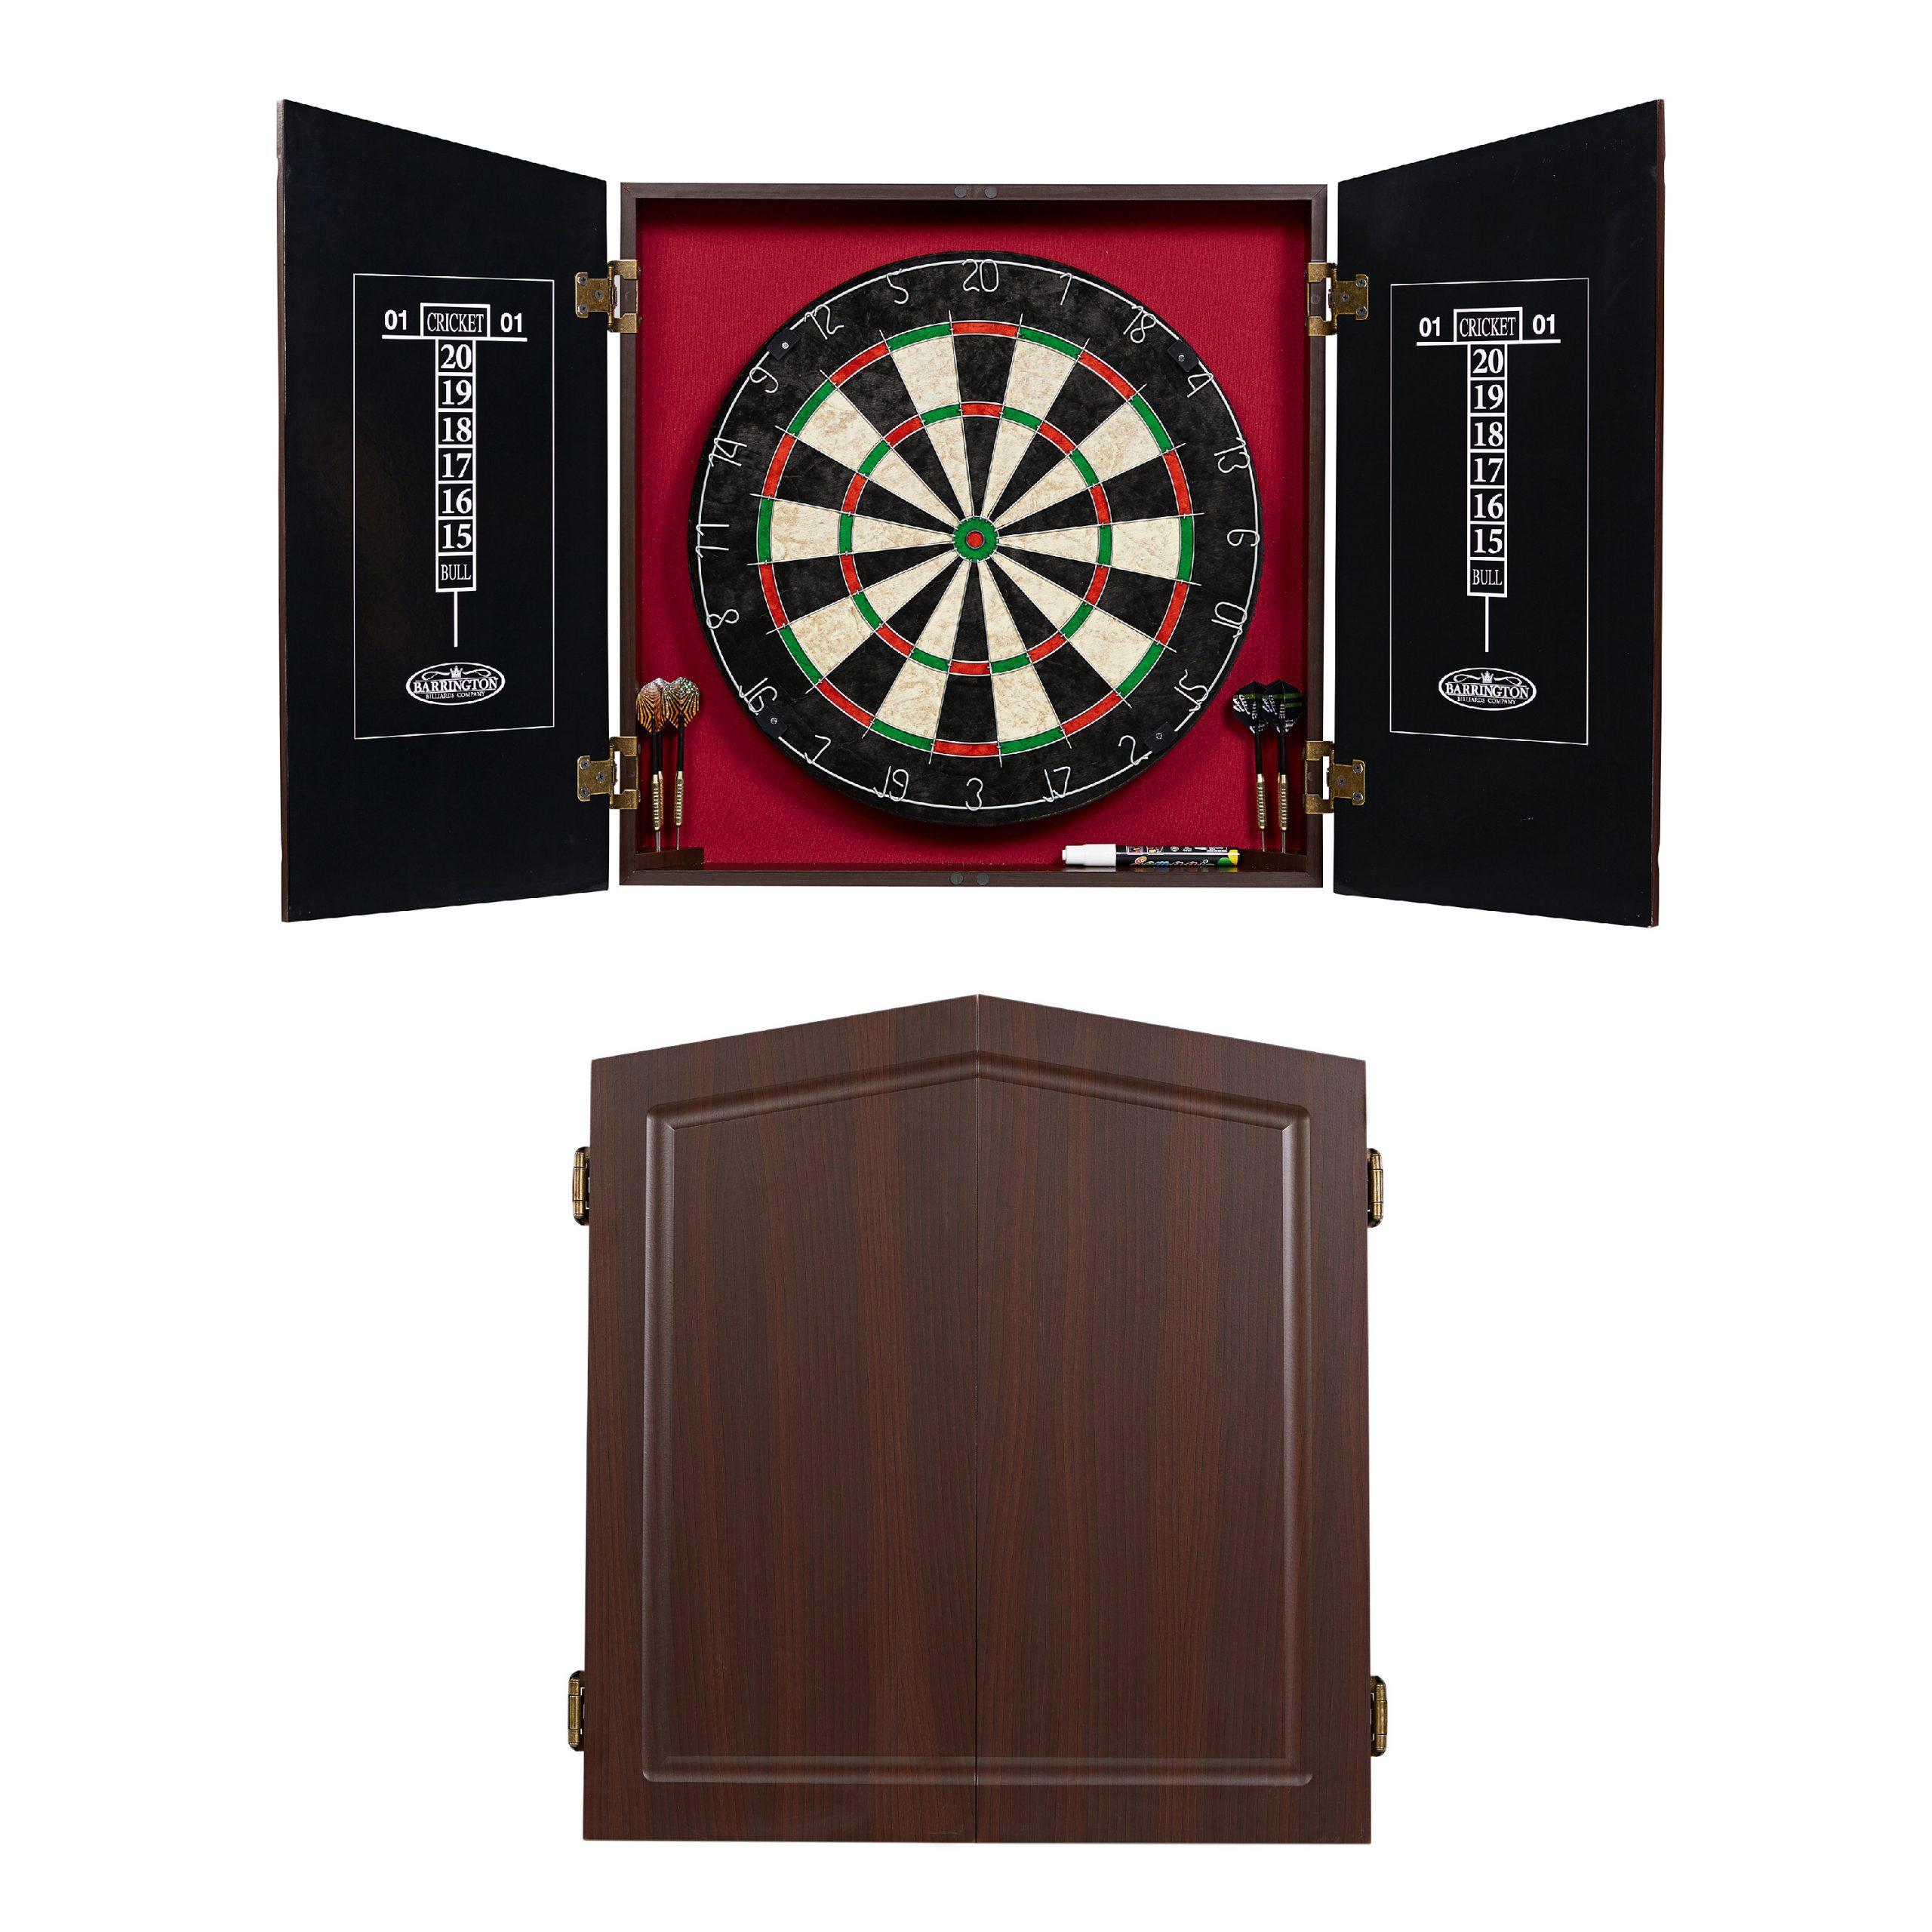 barrington paxton dartboard